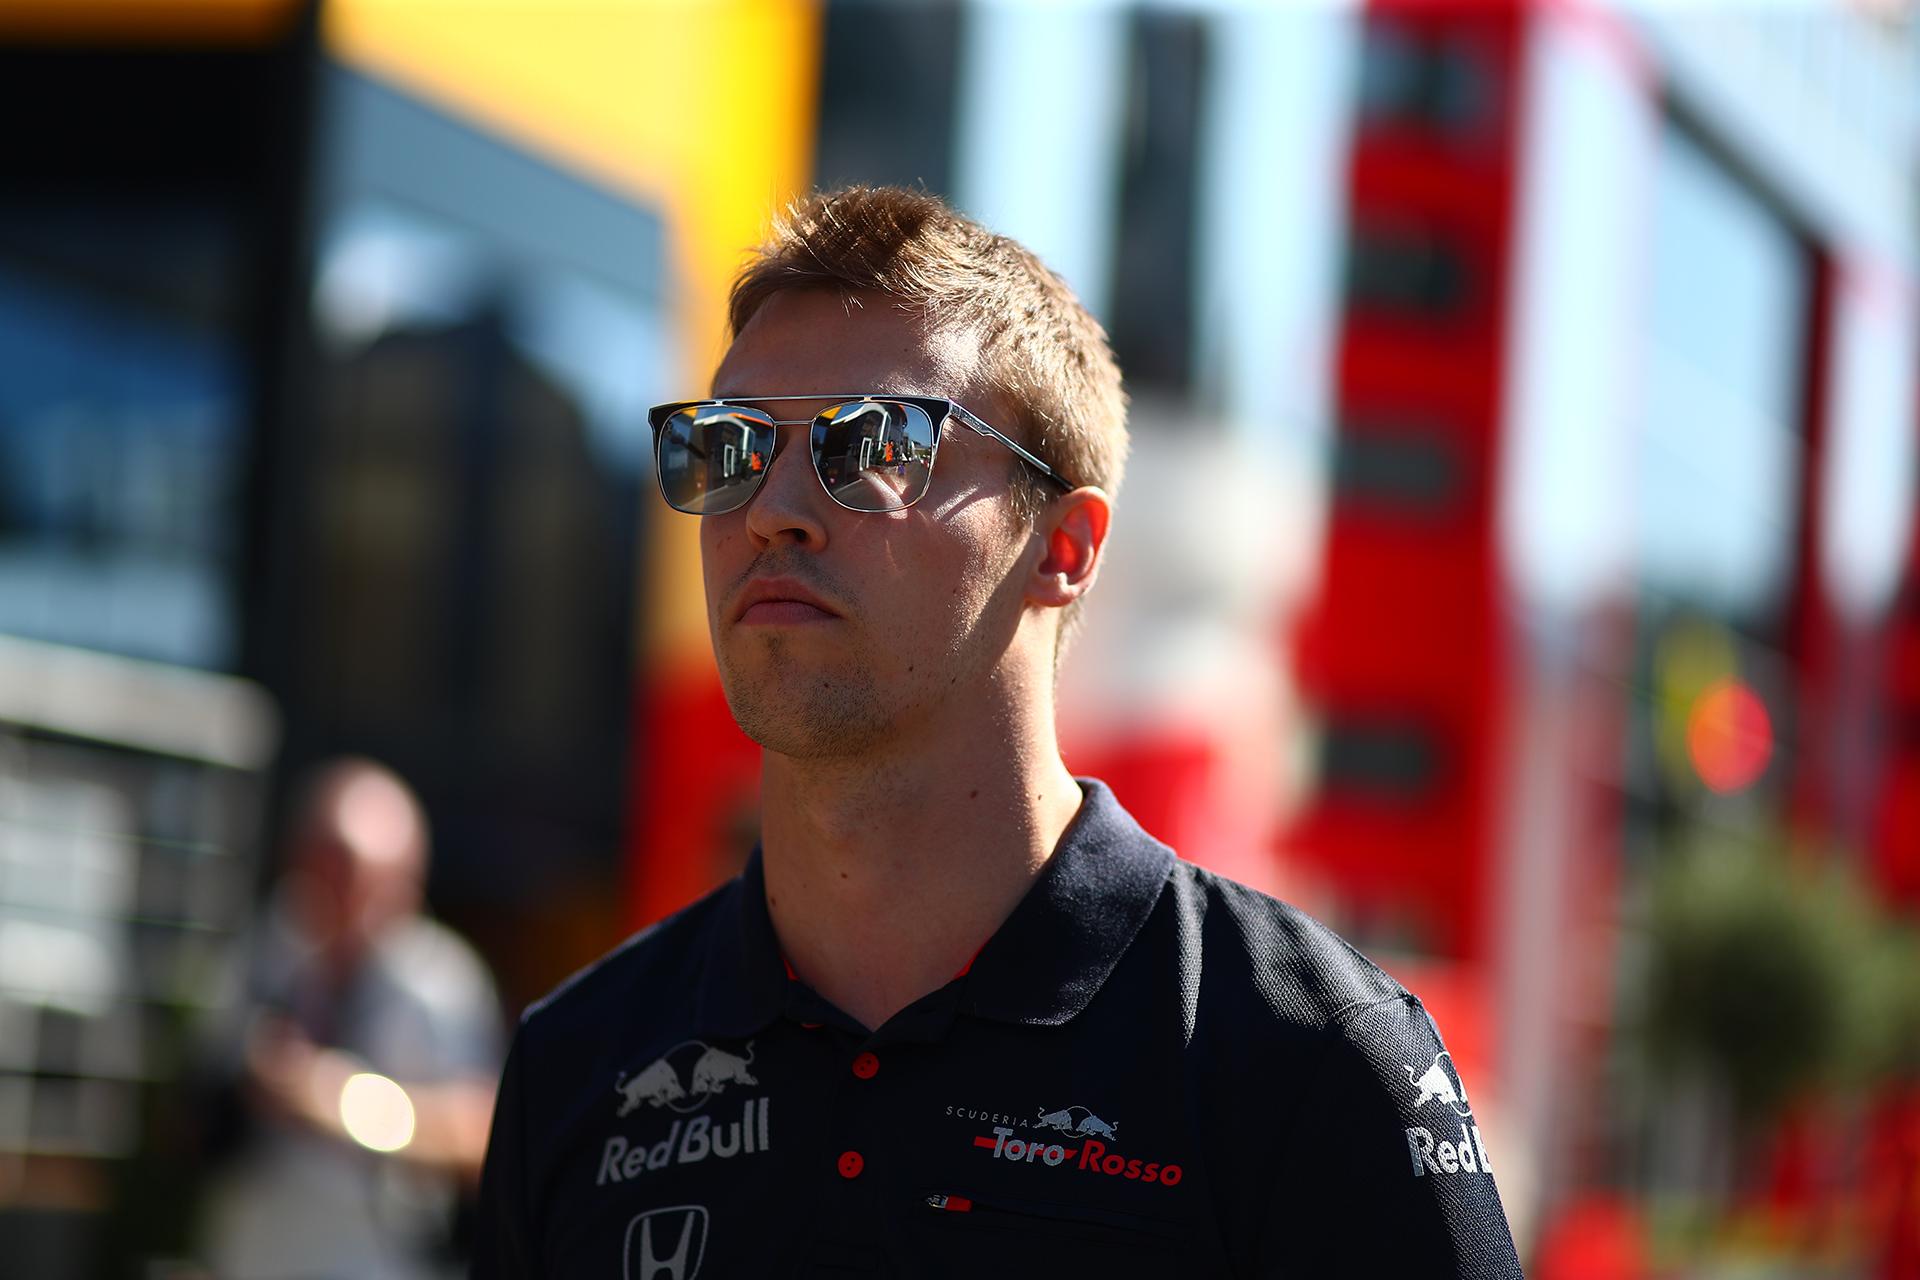 Daniil Kvyat (Toro Rosso Honda), USD 845.000